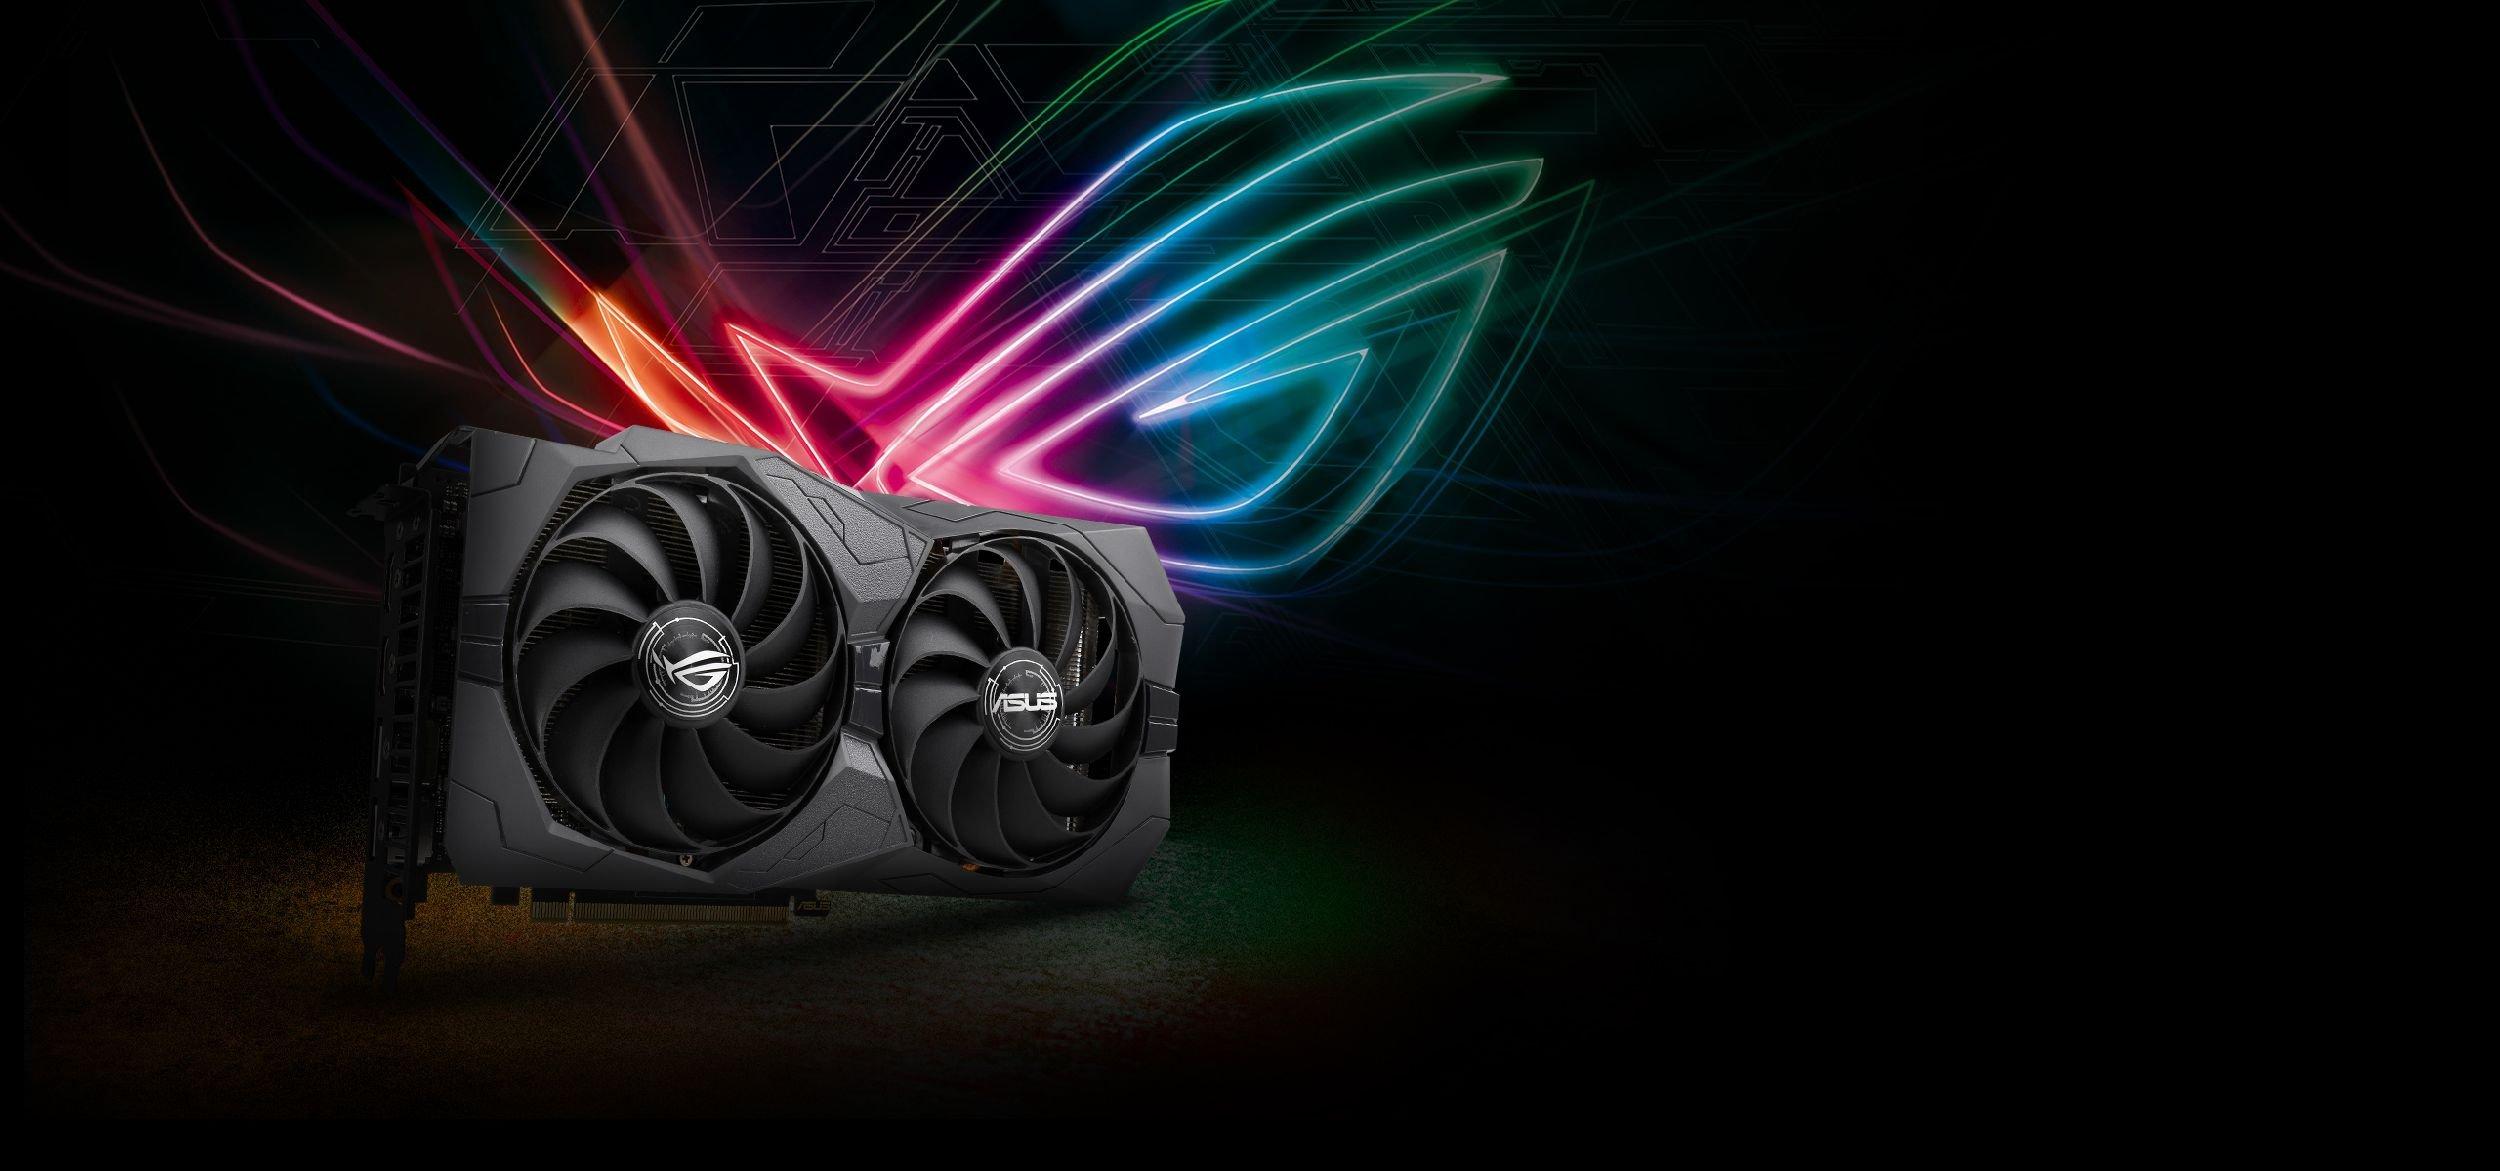 ASUS GeForce GTX 1650 SUPER ROG Advanced 4GB GDDR6 (90YV0E11-M0NA00) - фото 6414253_2019_12_10_15_52_05882175955.jpeg